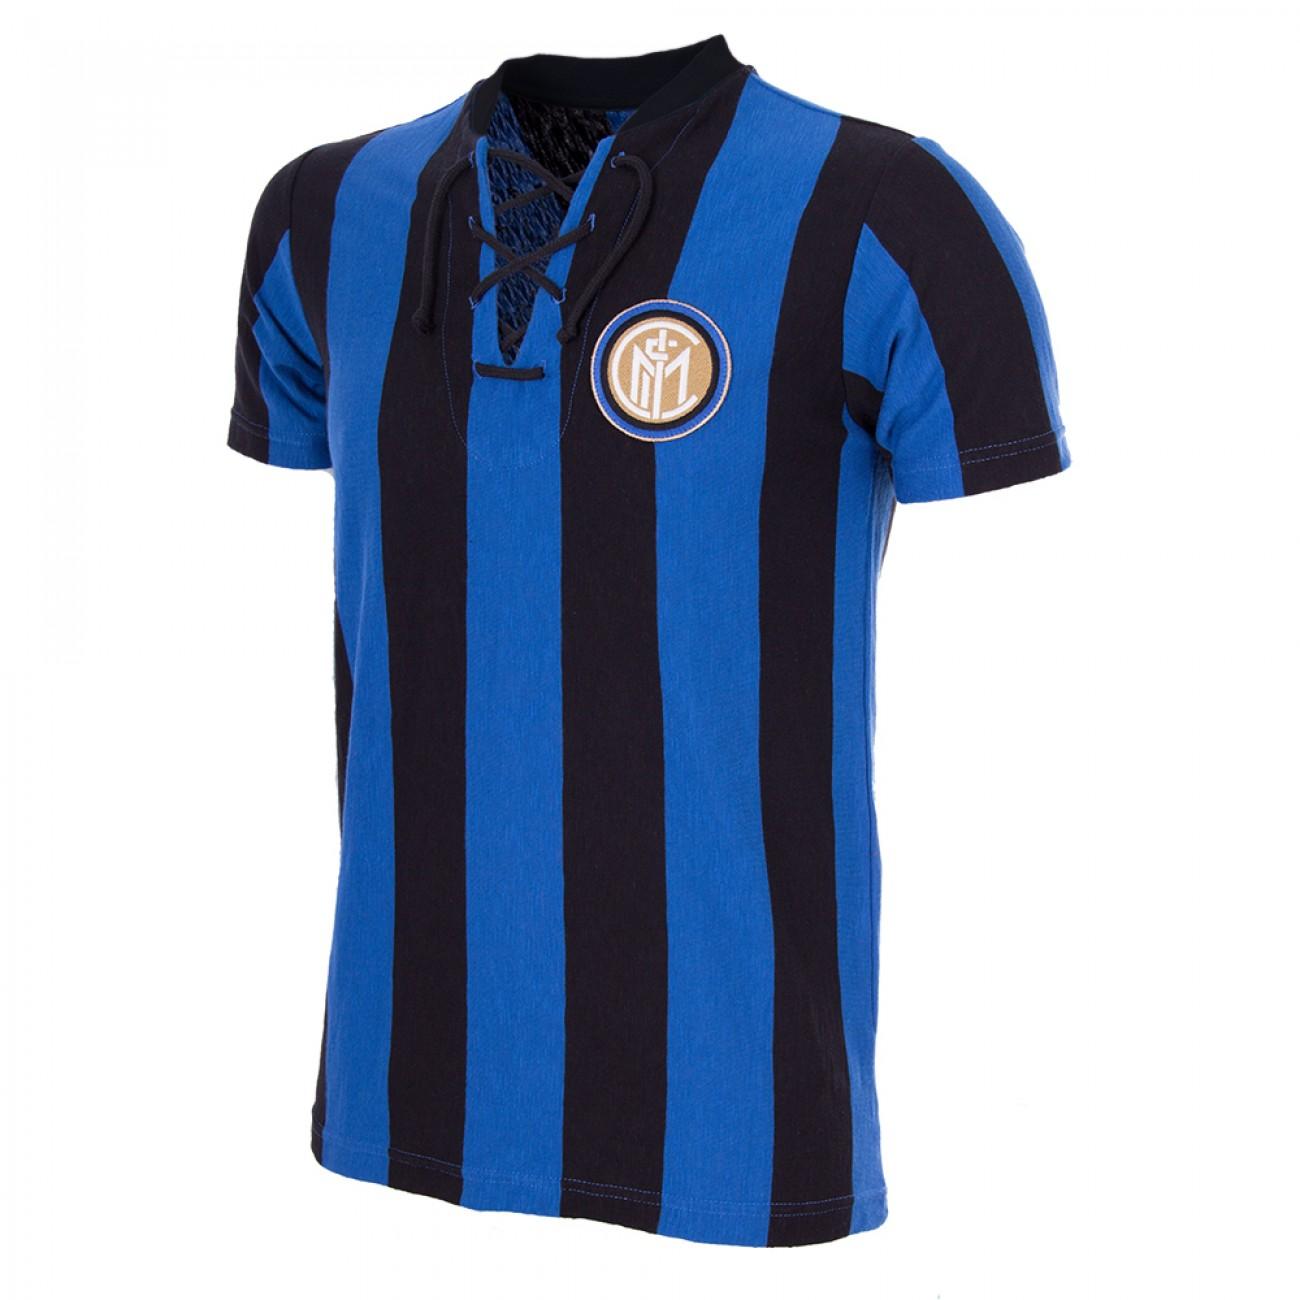 http://www.retrofootball.es/ropa-de-futbol/camiseta-inter-de-milan-1958-59.html